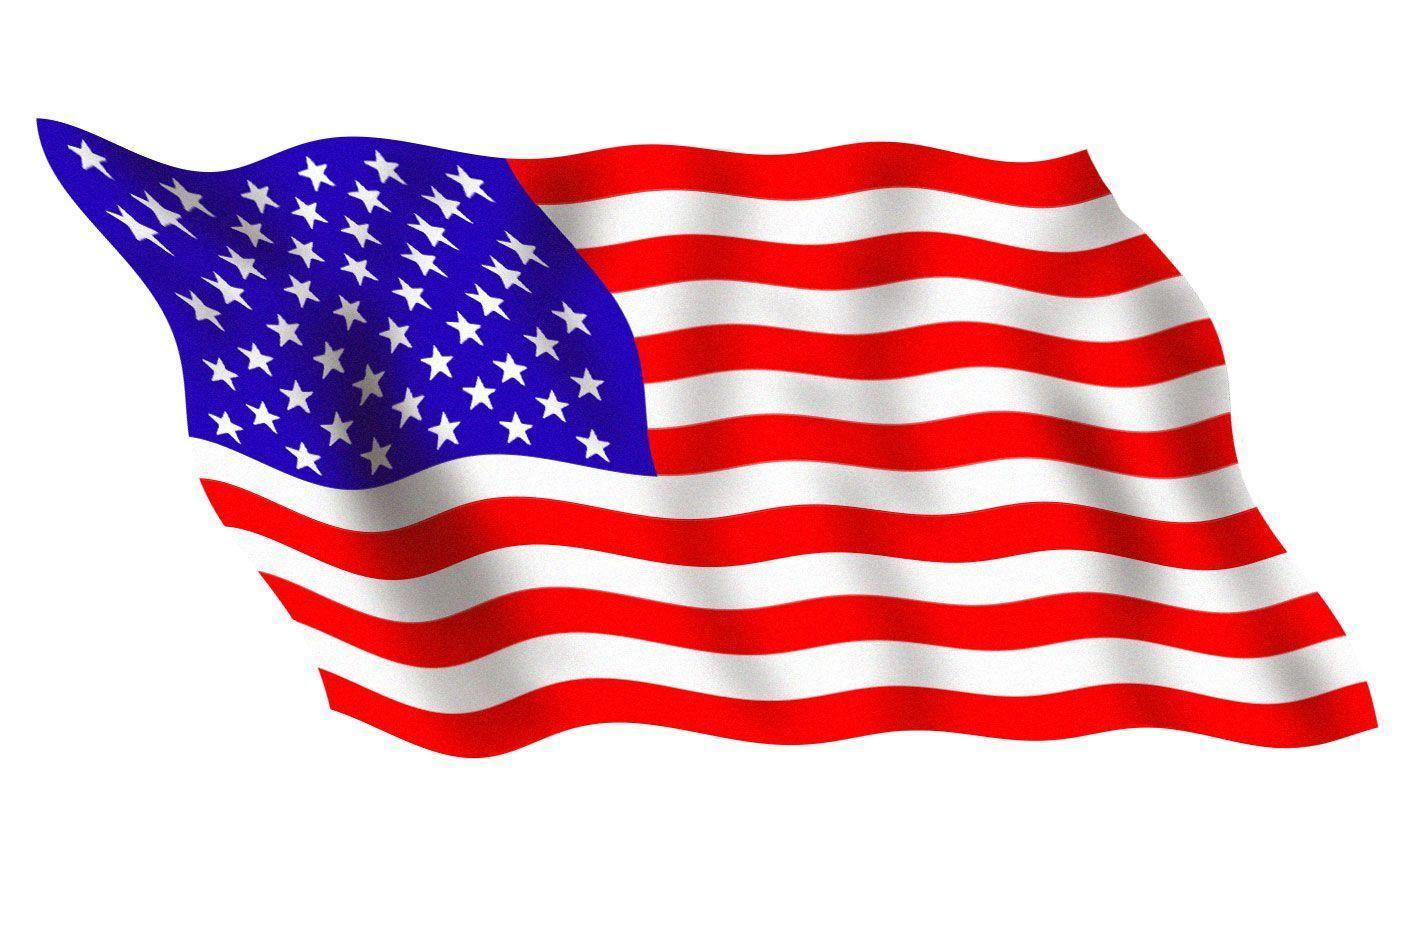 United States Flag Backgrounds 1405x945